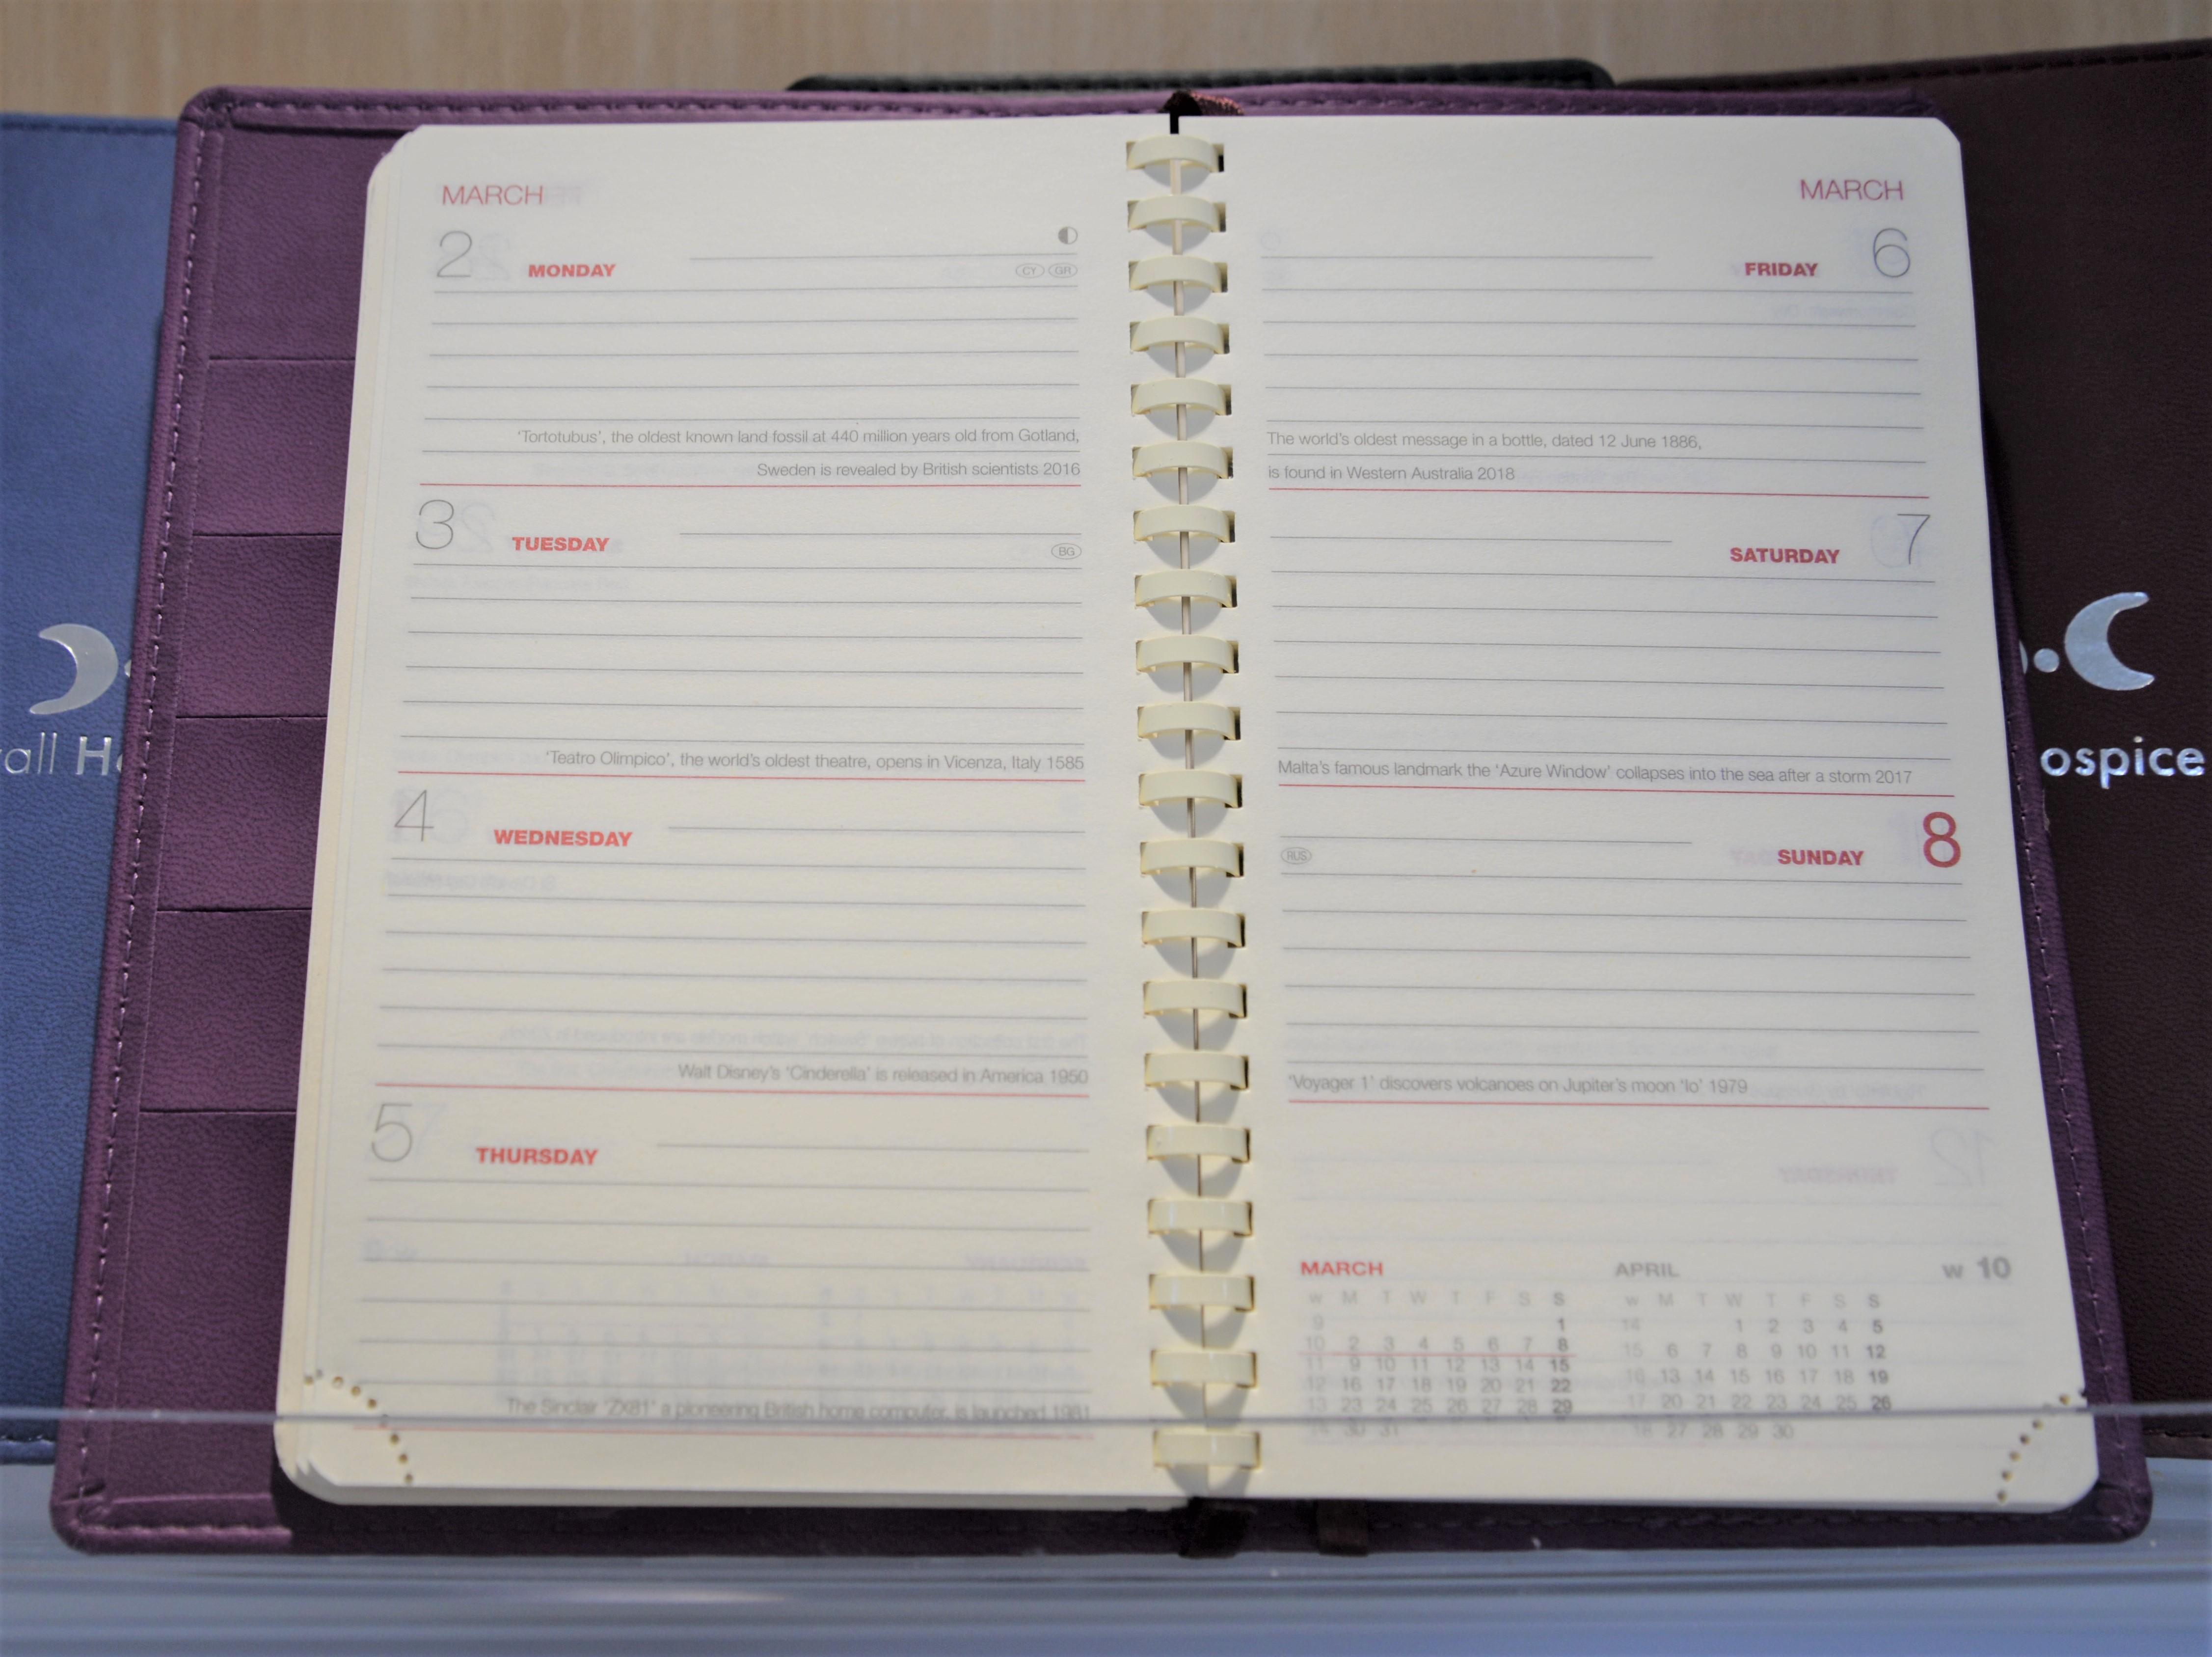 2020 Diary Inside Week To View inside Hospice Week 2020